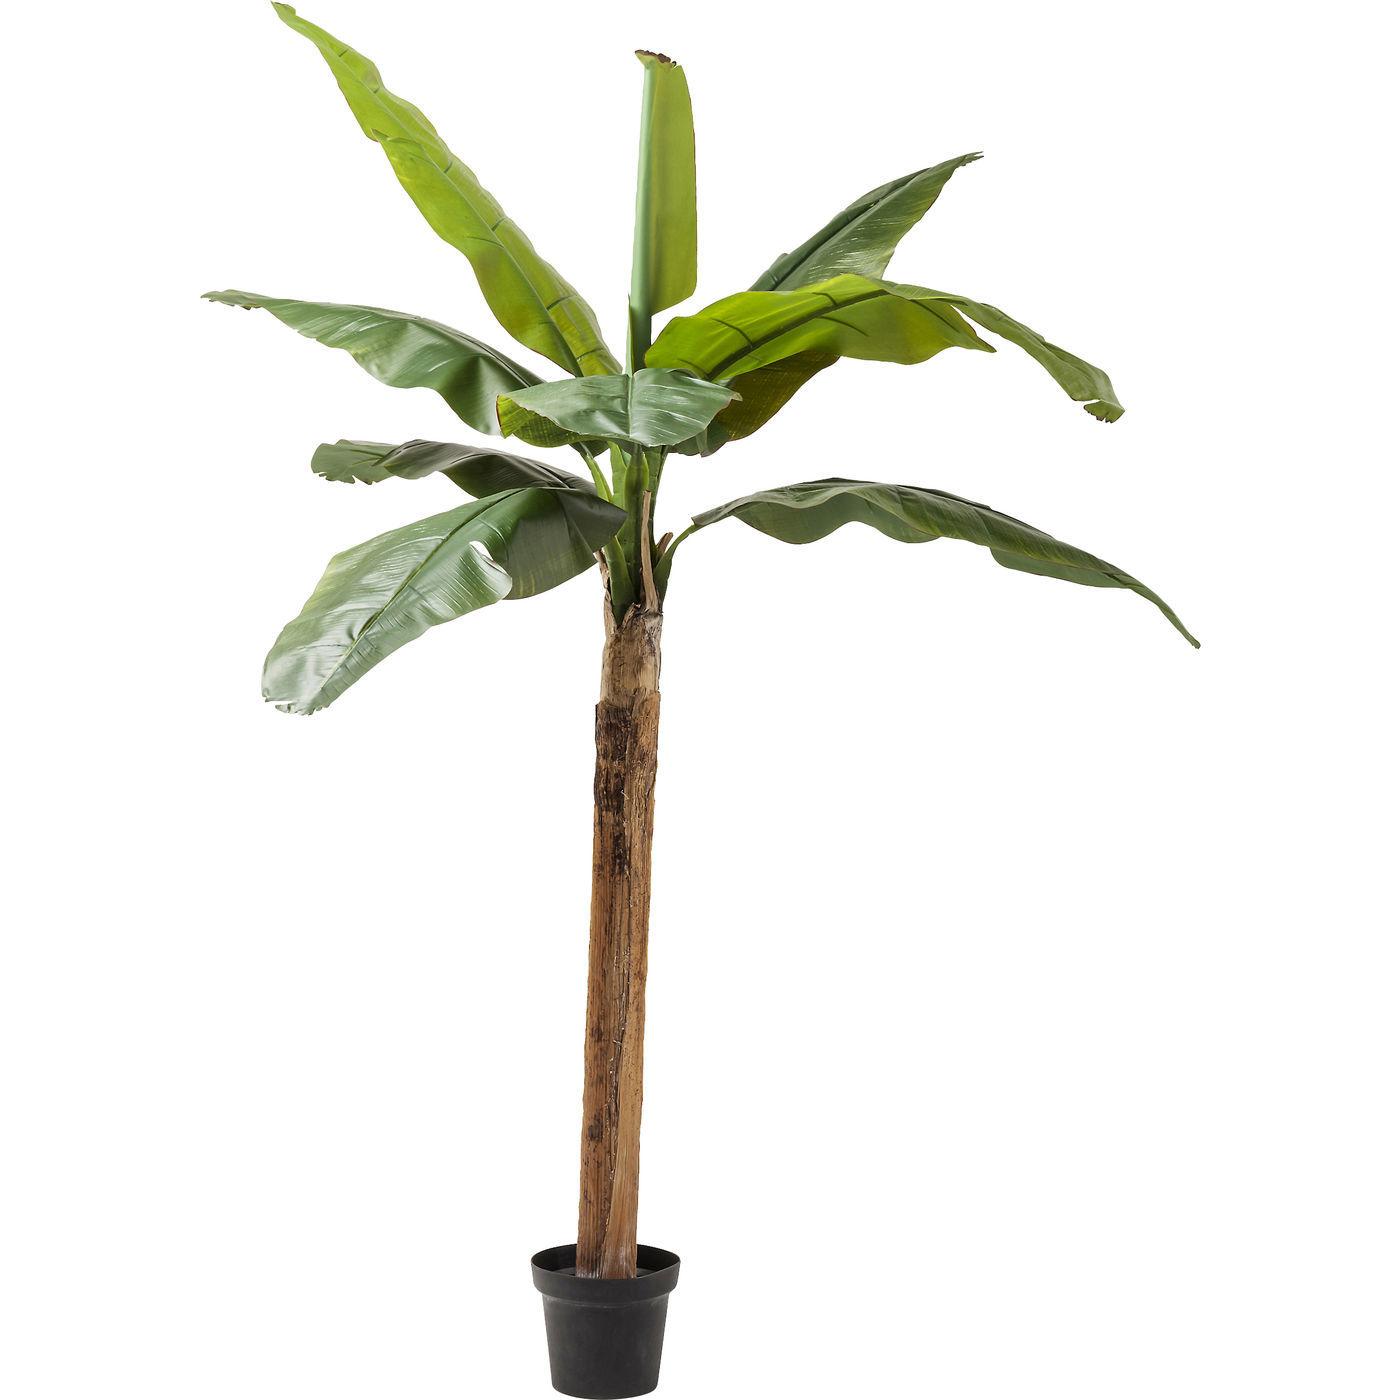 Deco Plant Banana Tree 190cm - KARE Tallinn